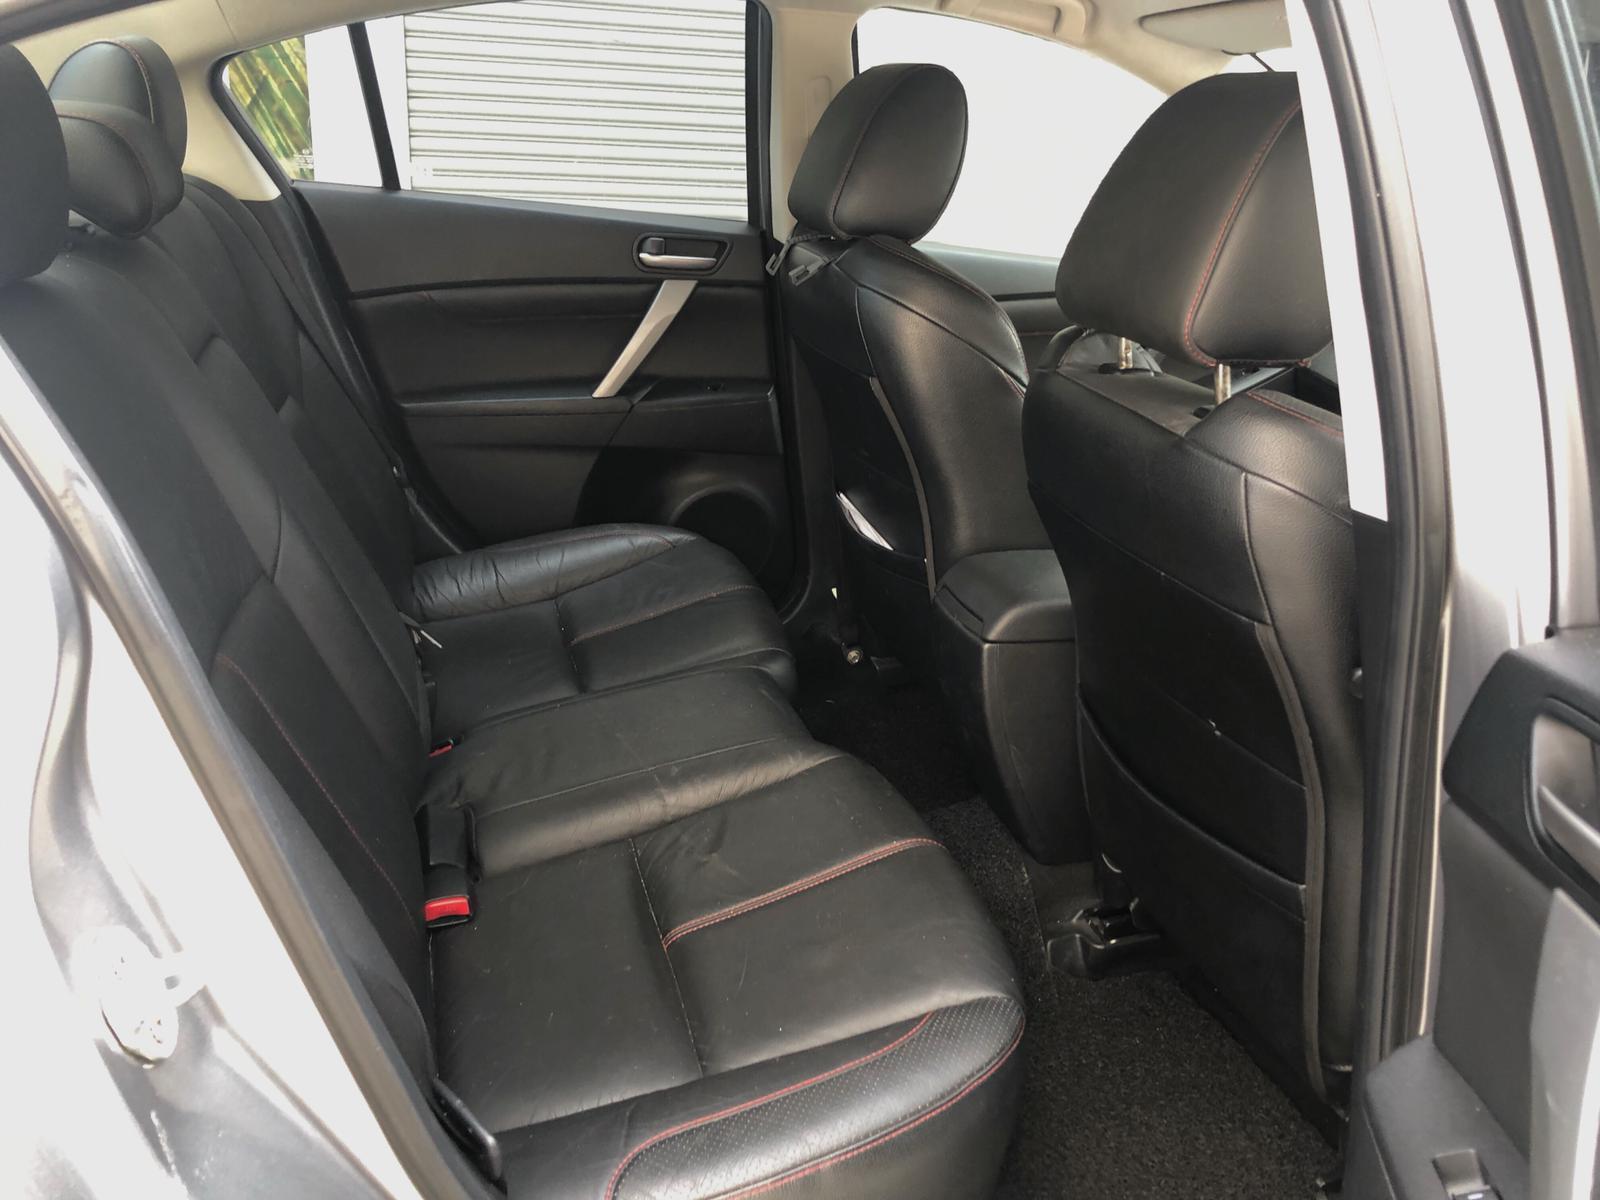 Mazda 3 Wish Altis Car Axio Premio Allion Camry Estima Jazz Fit Stream Civic Cars Hyundai Avanterent cheap for gojek grab n personal use